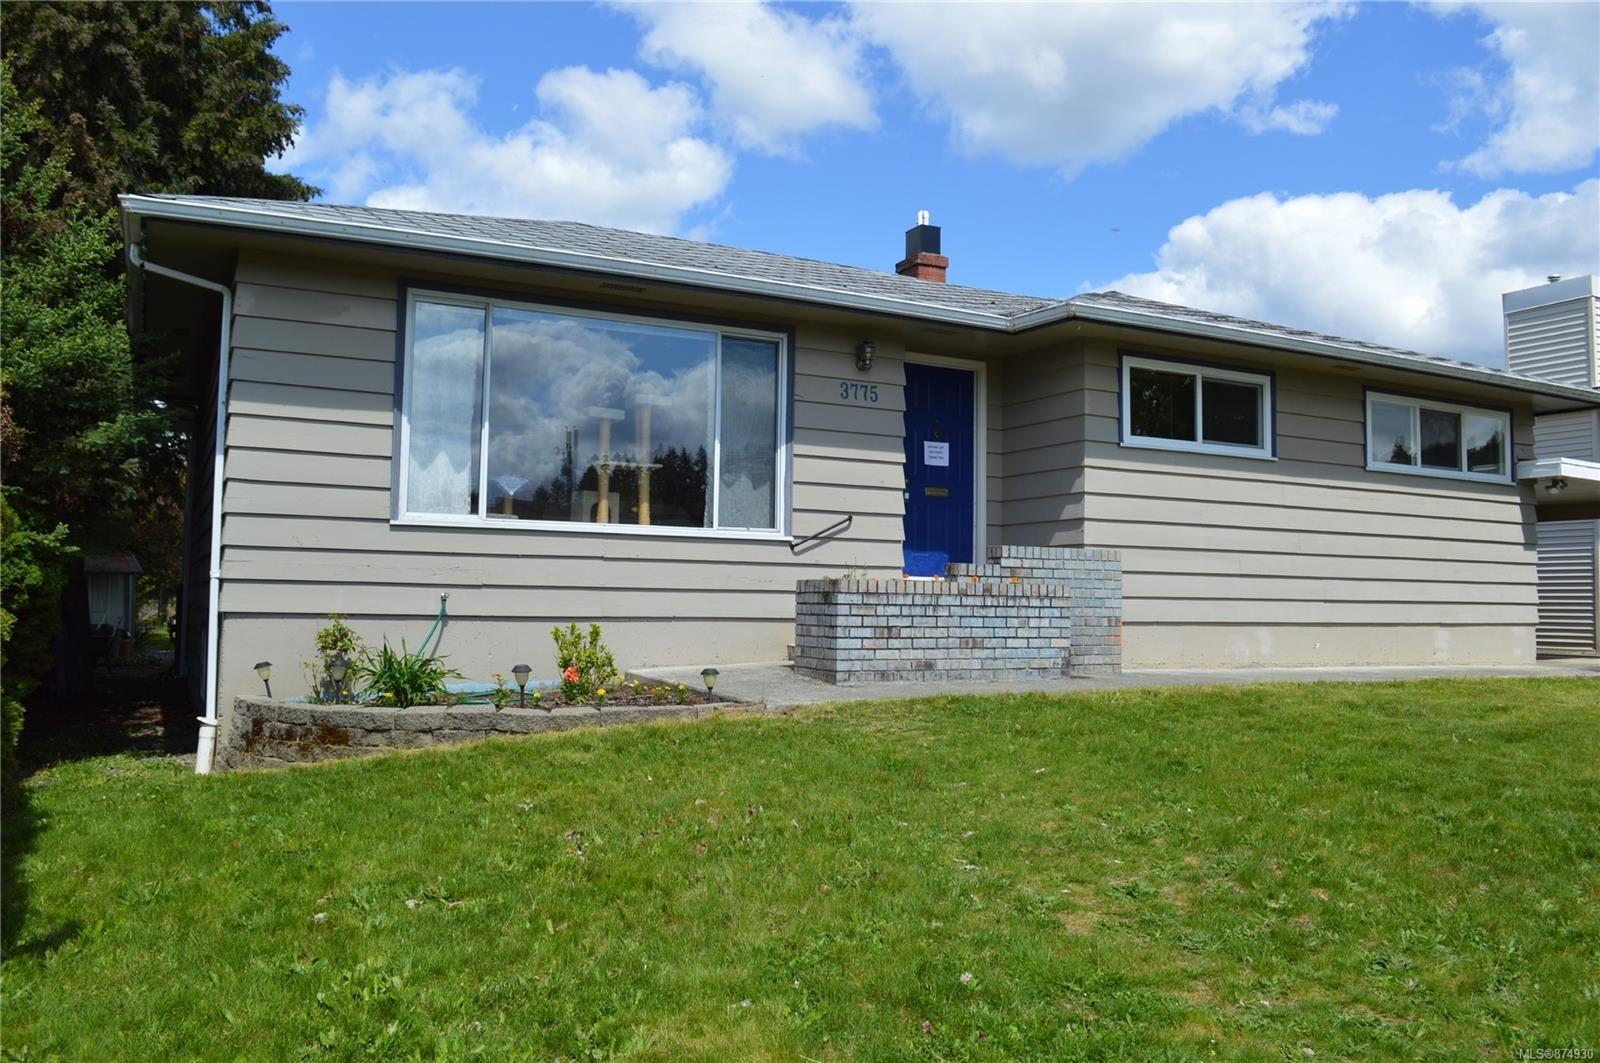 Main Photo: 3775 Maitland St in : PA Port Alberni House for sale (Port Alberni)  : MLS®# 874930